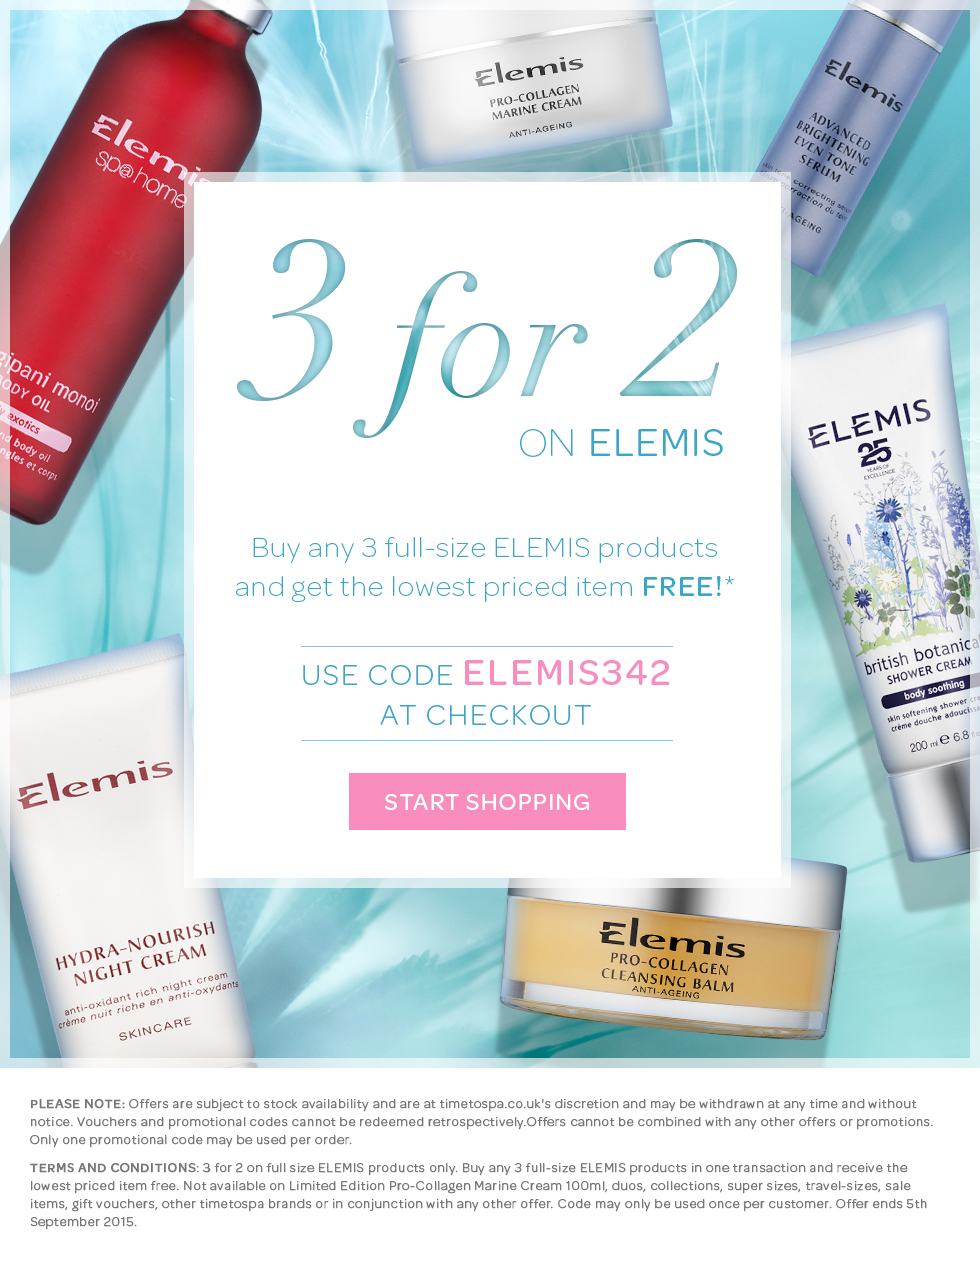 3 for 2 on ELEMIS